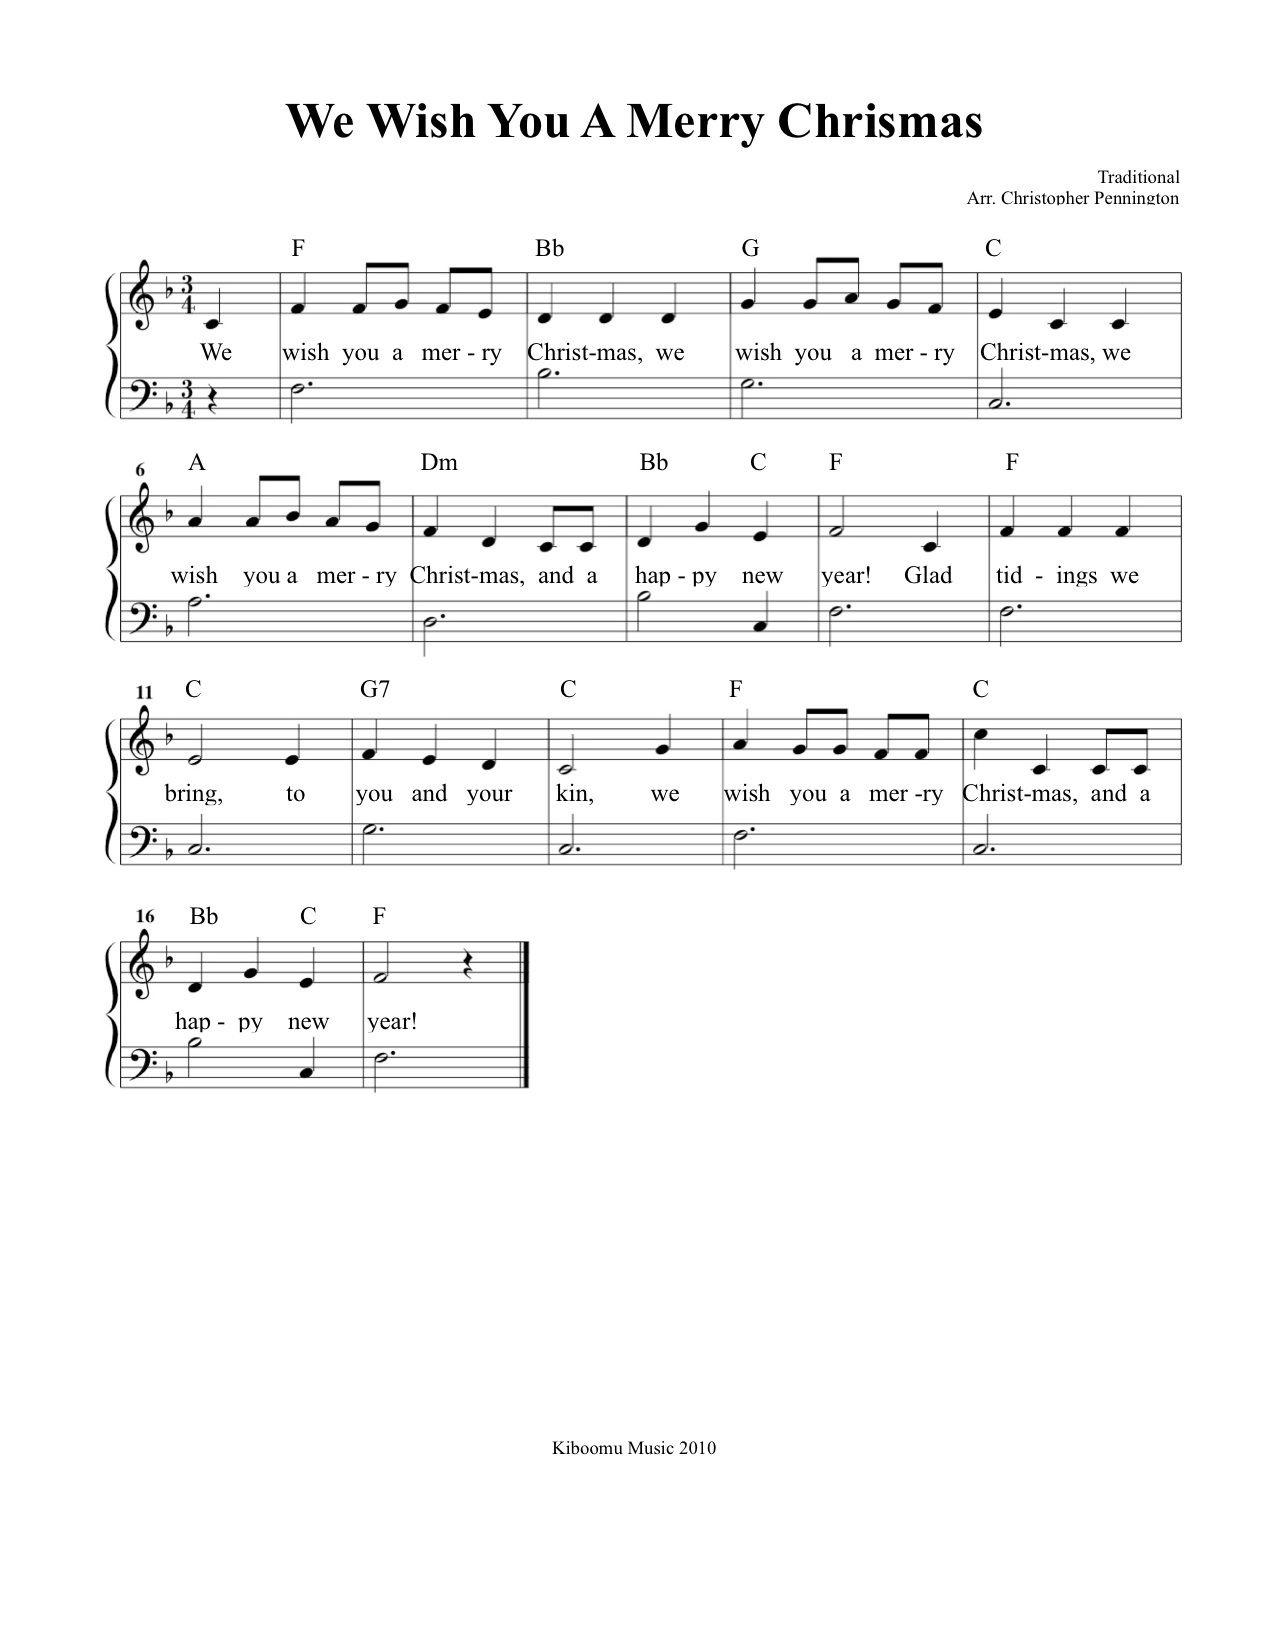 We Wish You A Merry Christmas Sheet Music And Song For Kids! | Music - Free Christmas Sheet Music For Keyboard Printable